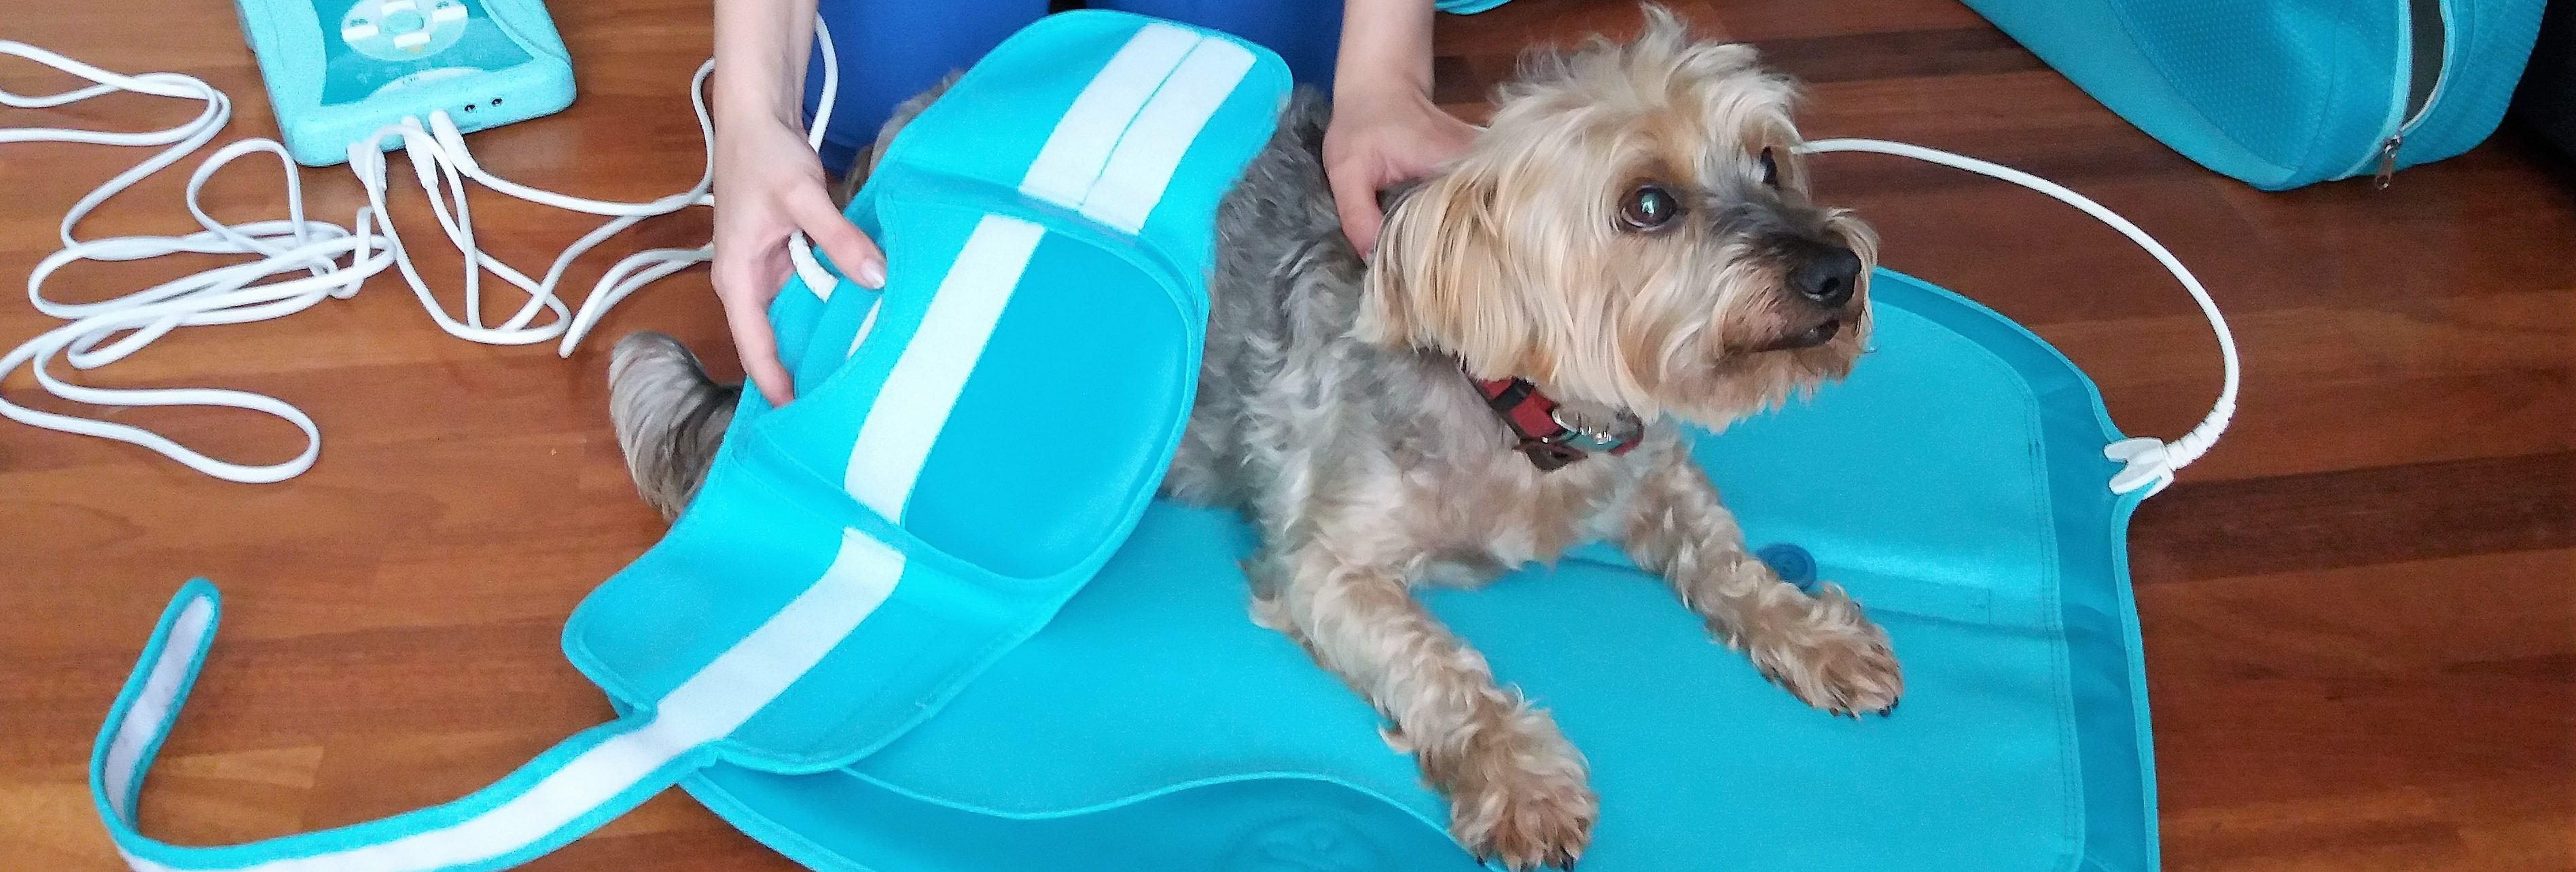 Magnetoterapia rehabilitación veterinaria